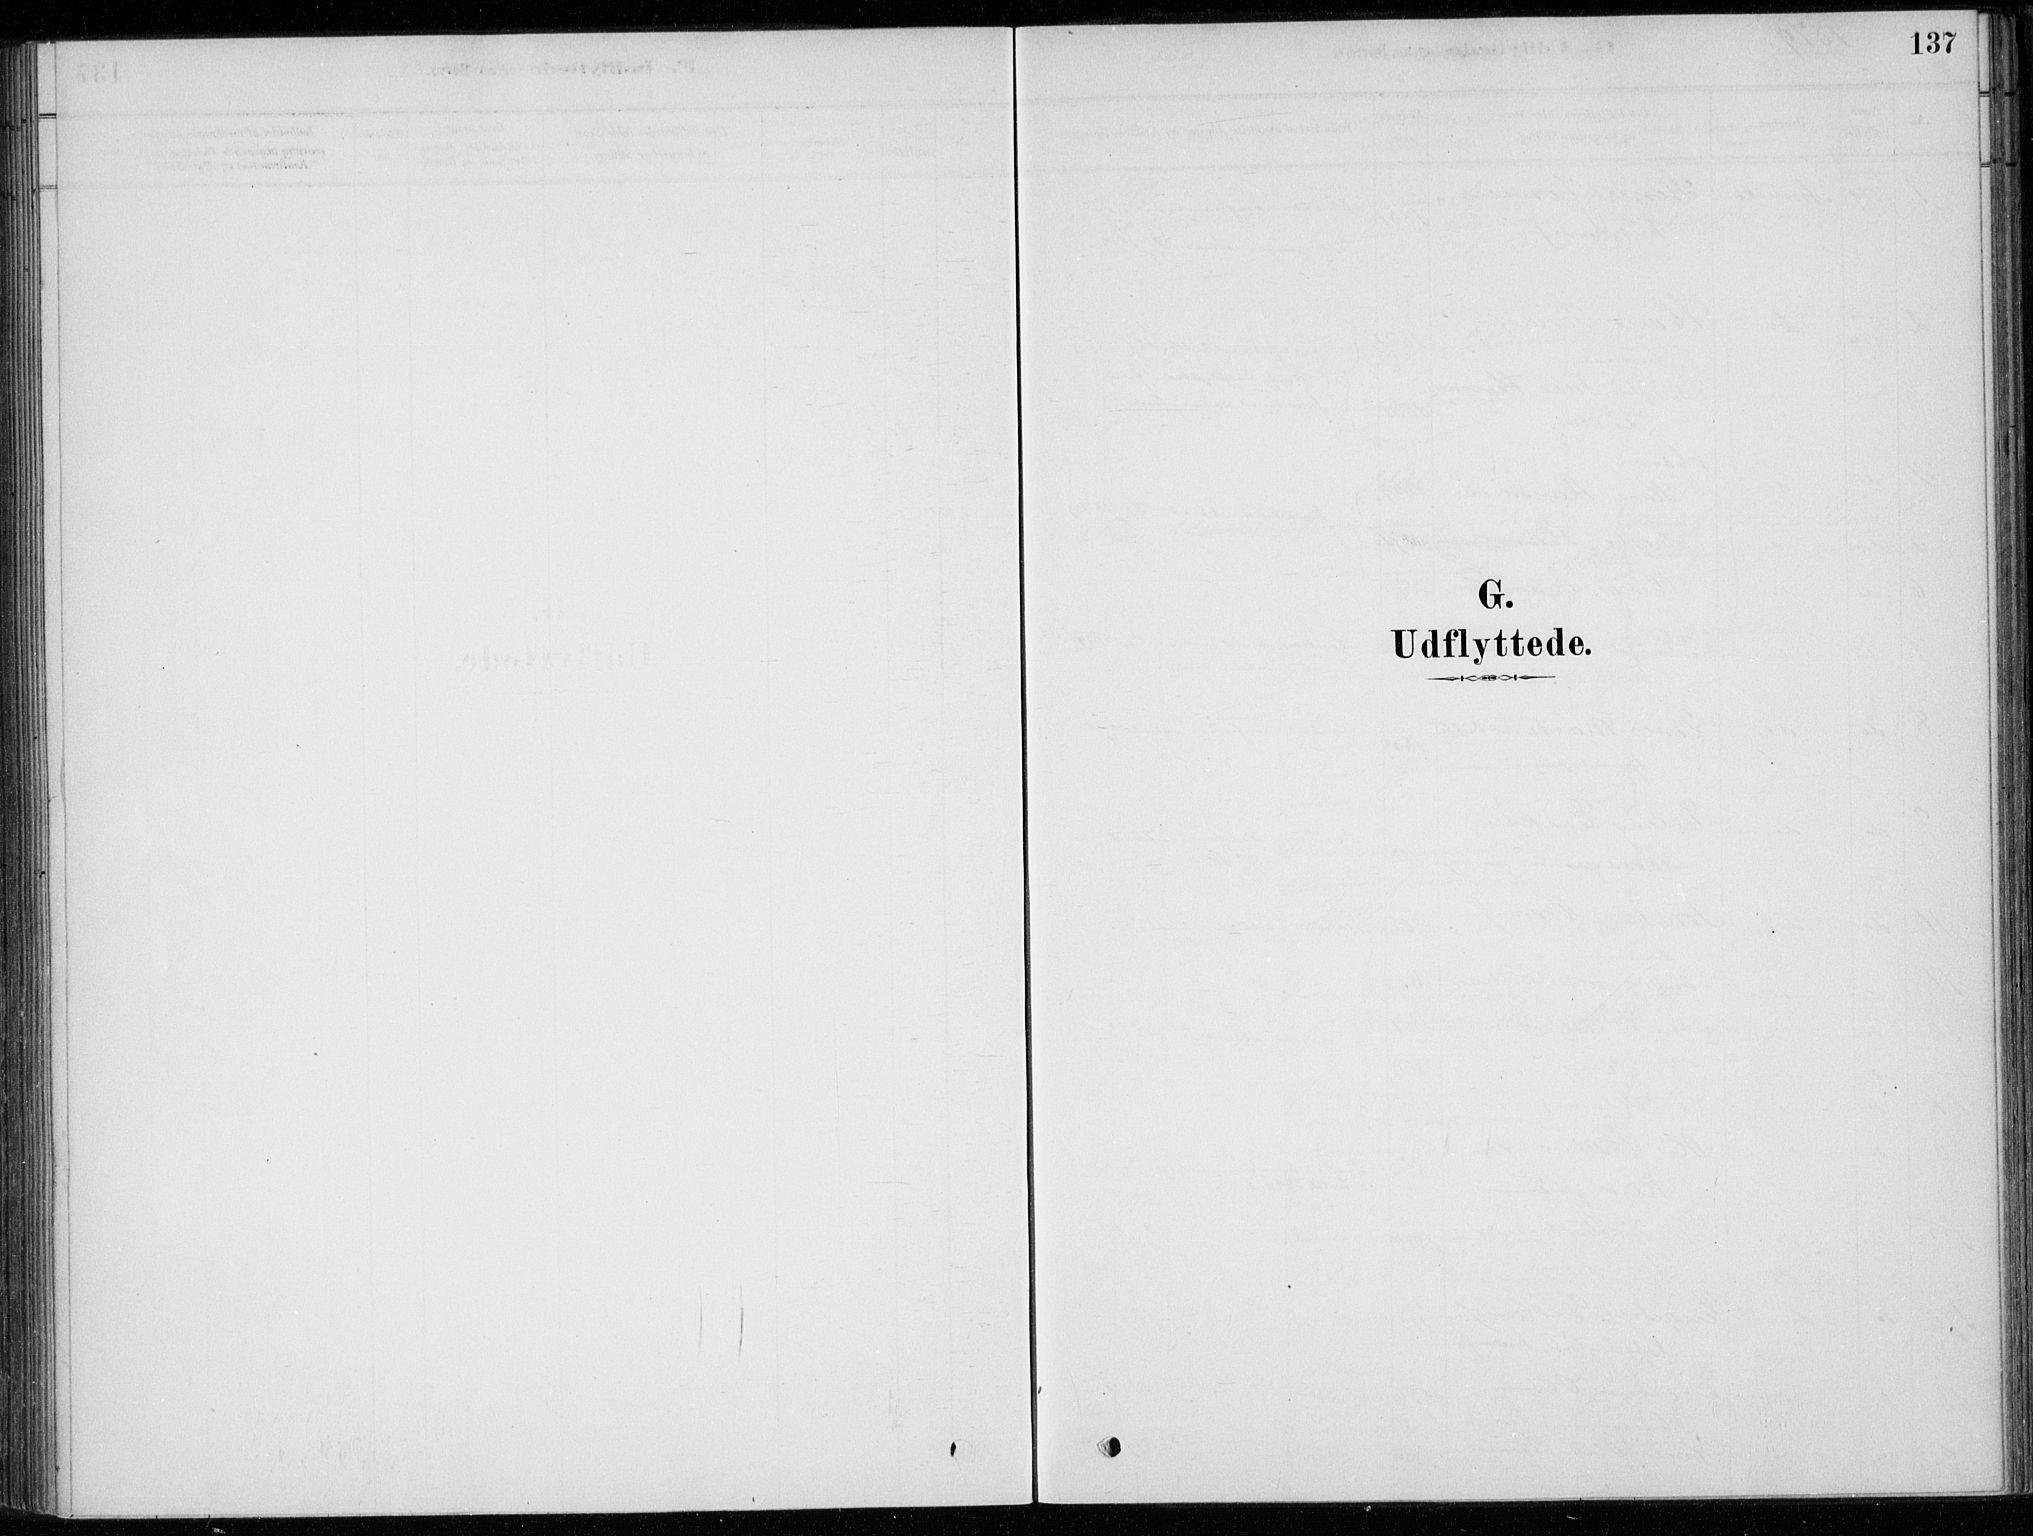 SAKO, Sigdal kirkebøker, F/Fc/L0001: Ministerialbok nr. III 1, 1879-1893, s. 137